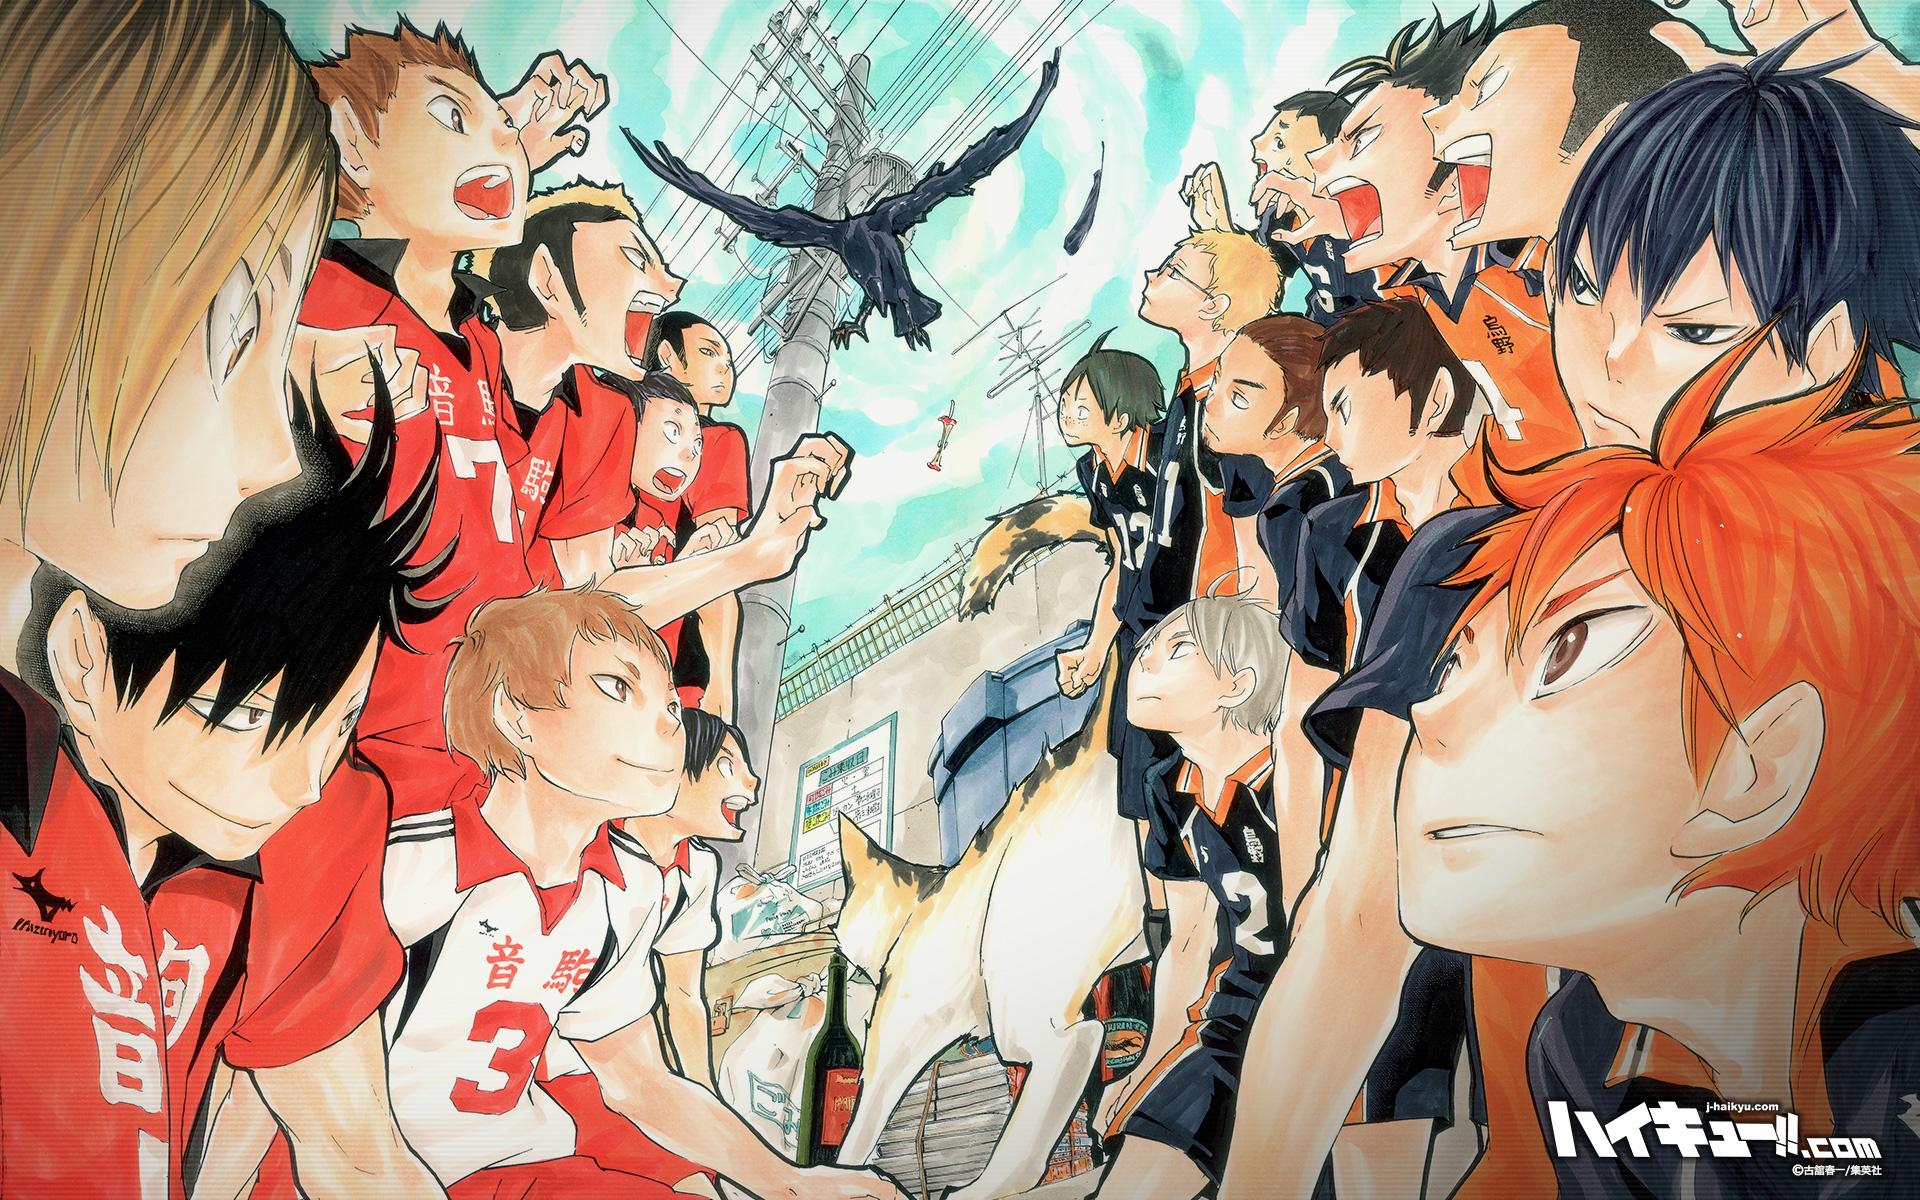 Anime Wallpapers Full Hd 19x10 Wallpaper Teahub Io